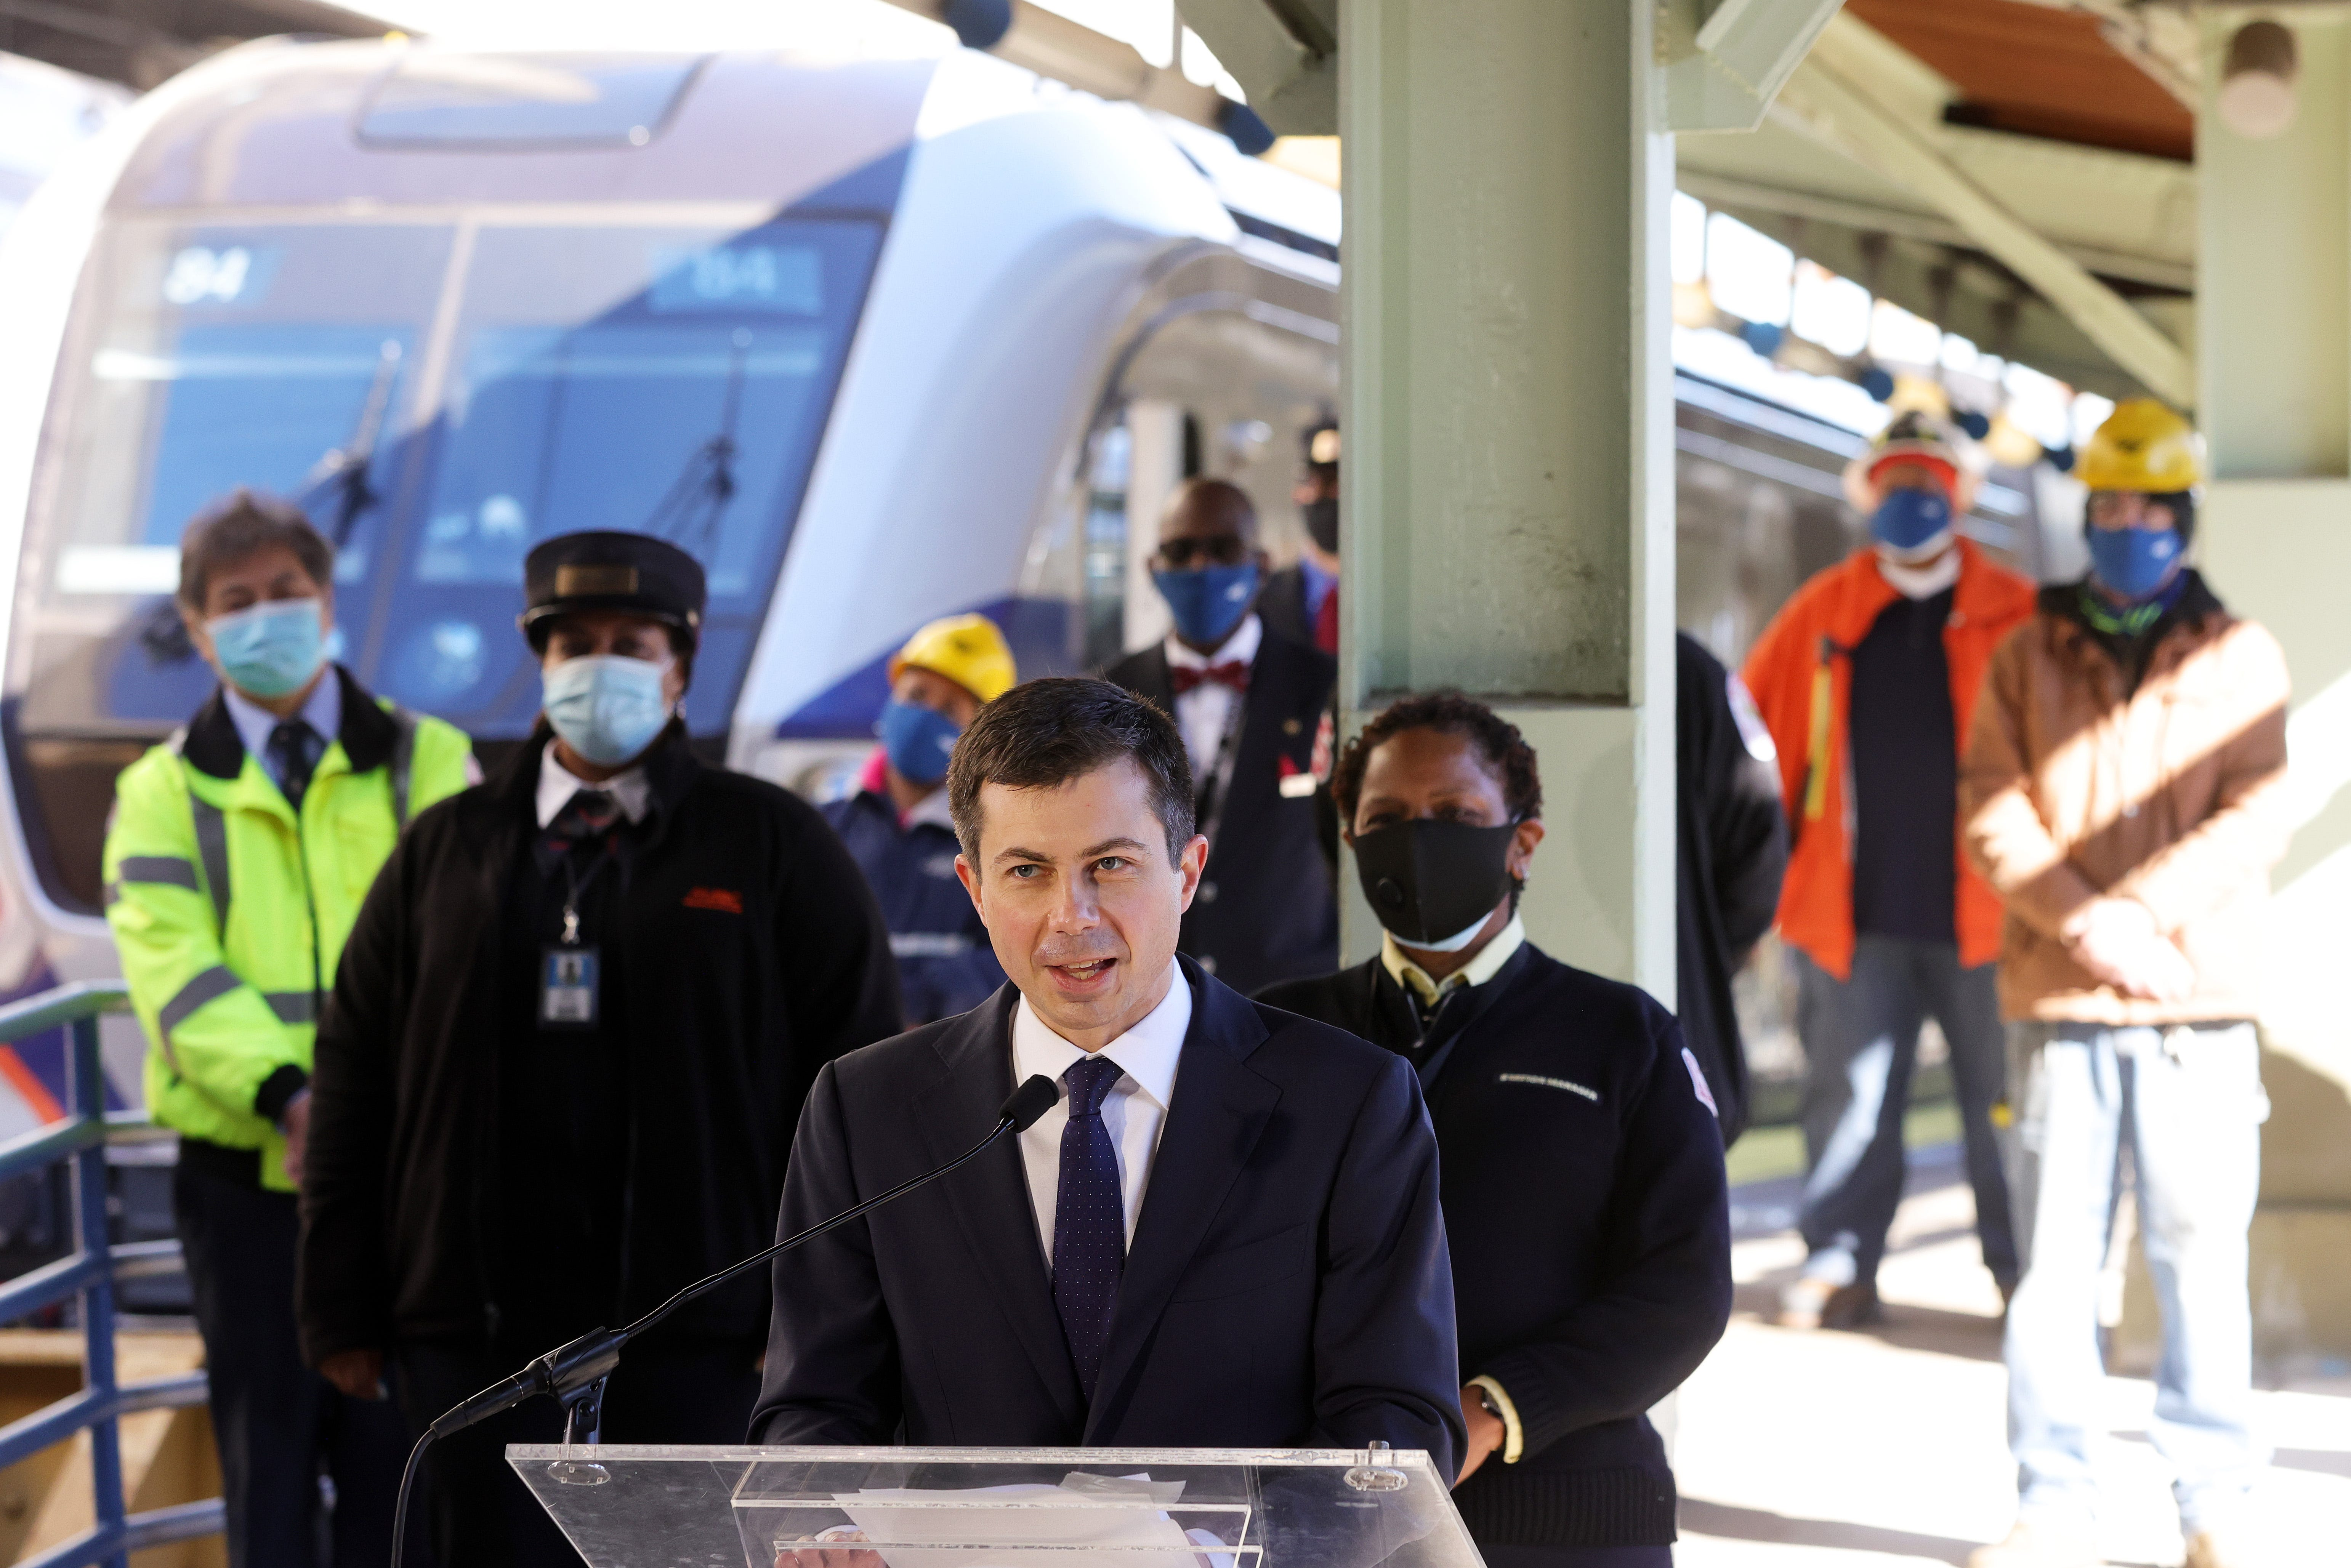 Secretary of Transportation Pete Buttigieg speaks to Amtrak employees during a visit to Union Station February 5, 2021 in Washington, DC.